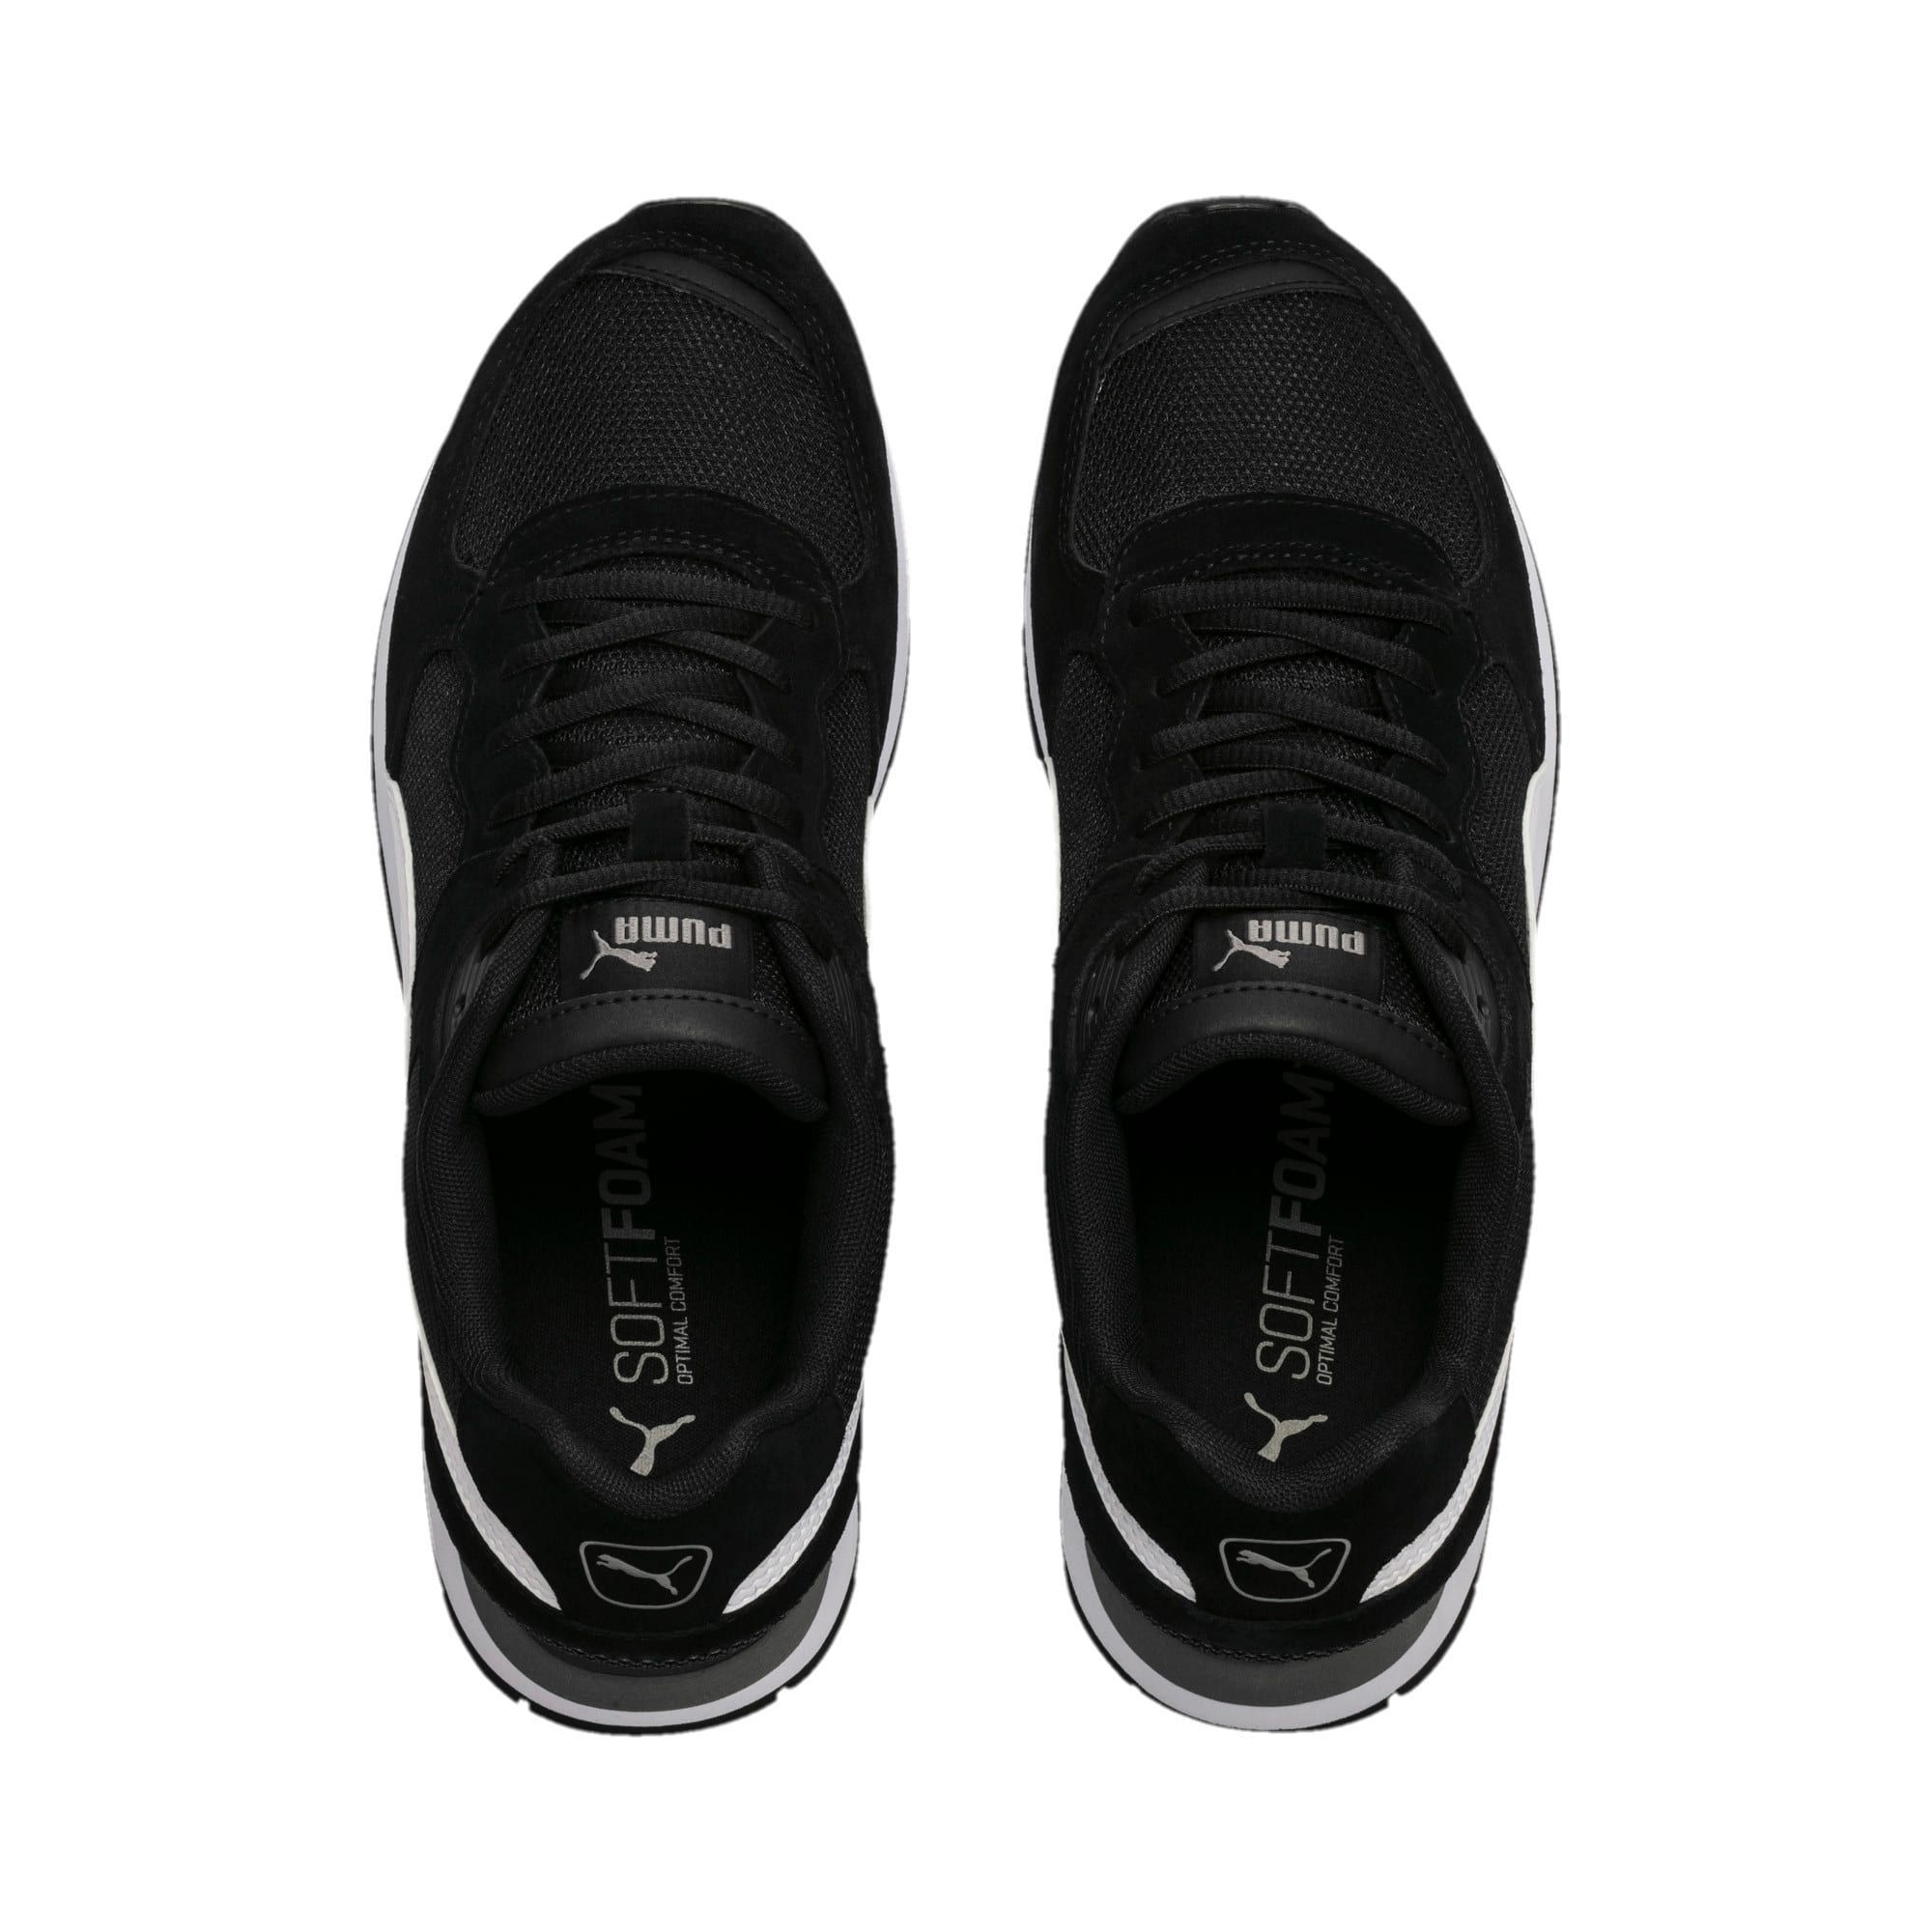 Thumbnail 6 of Vista Women's Sneakers, Black-White-Charcoal Gray, medium